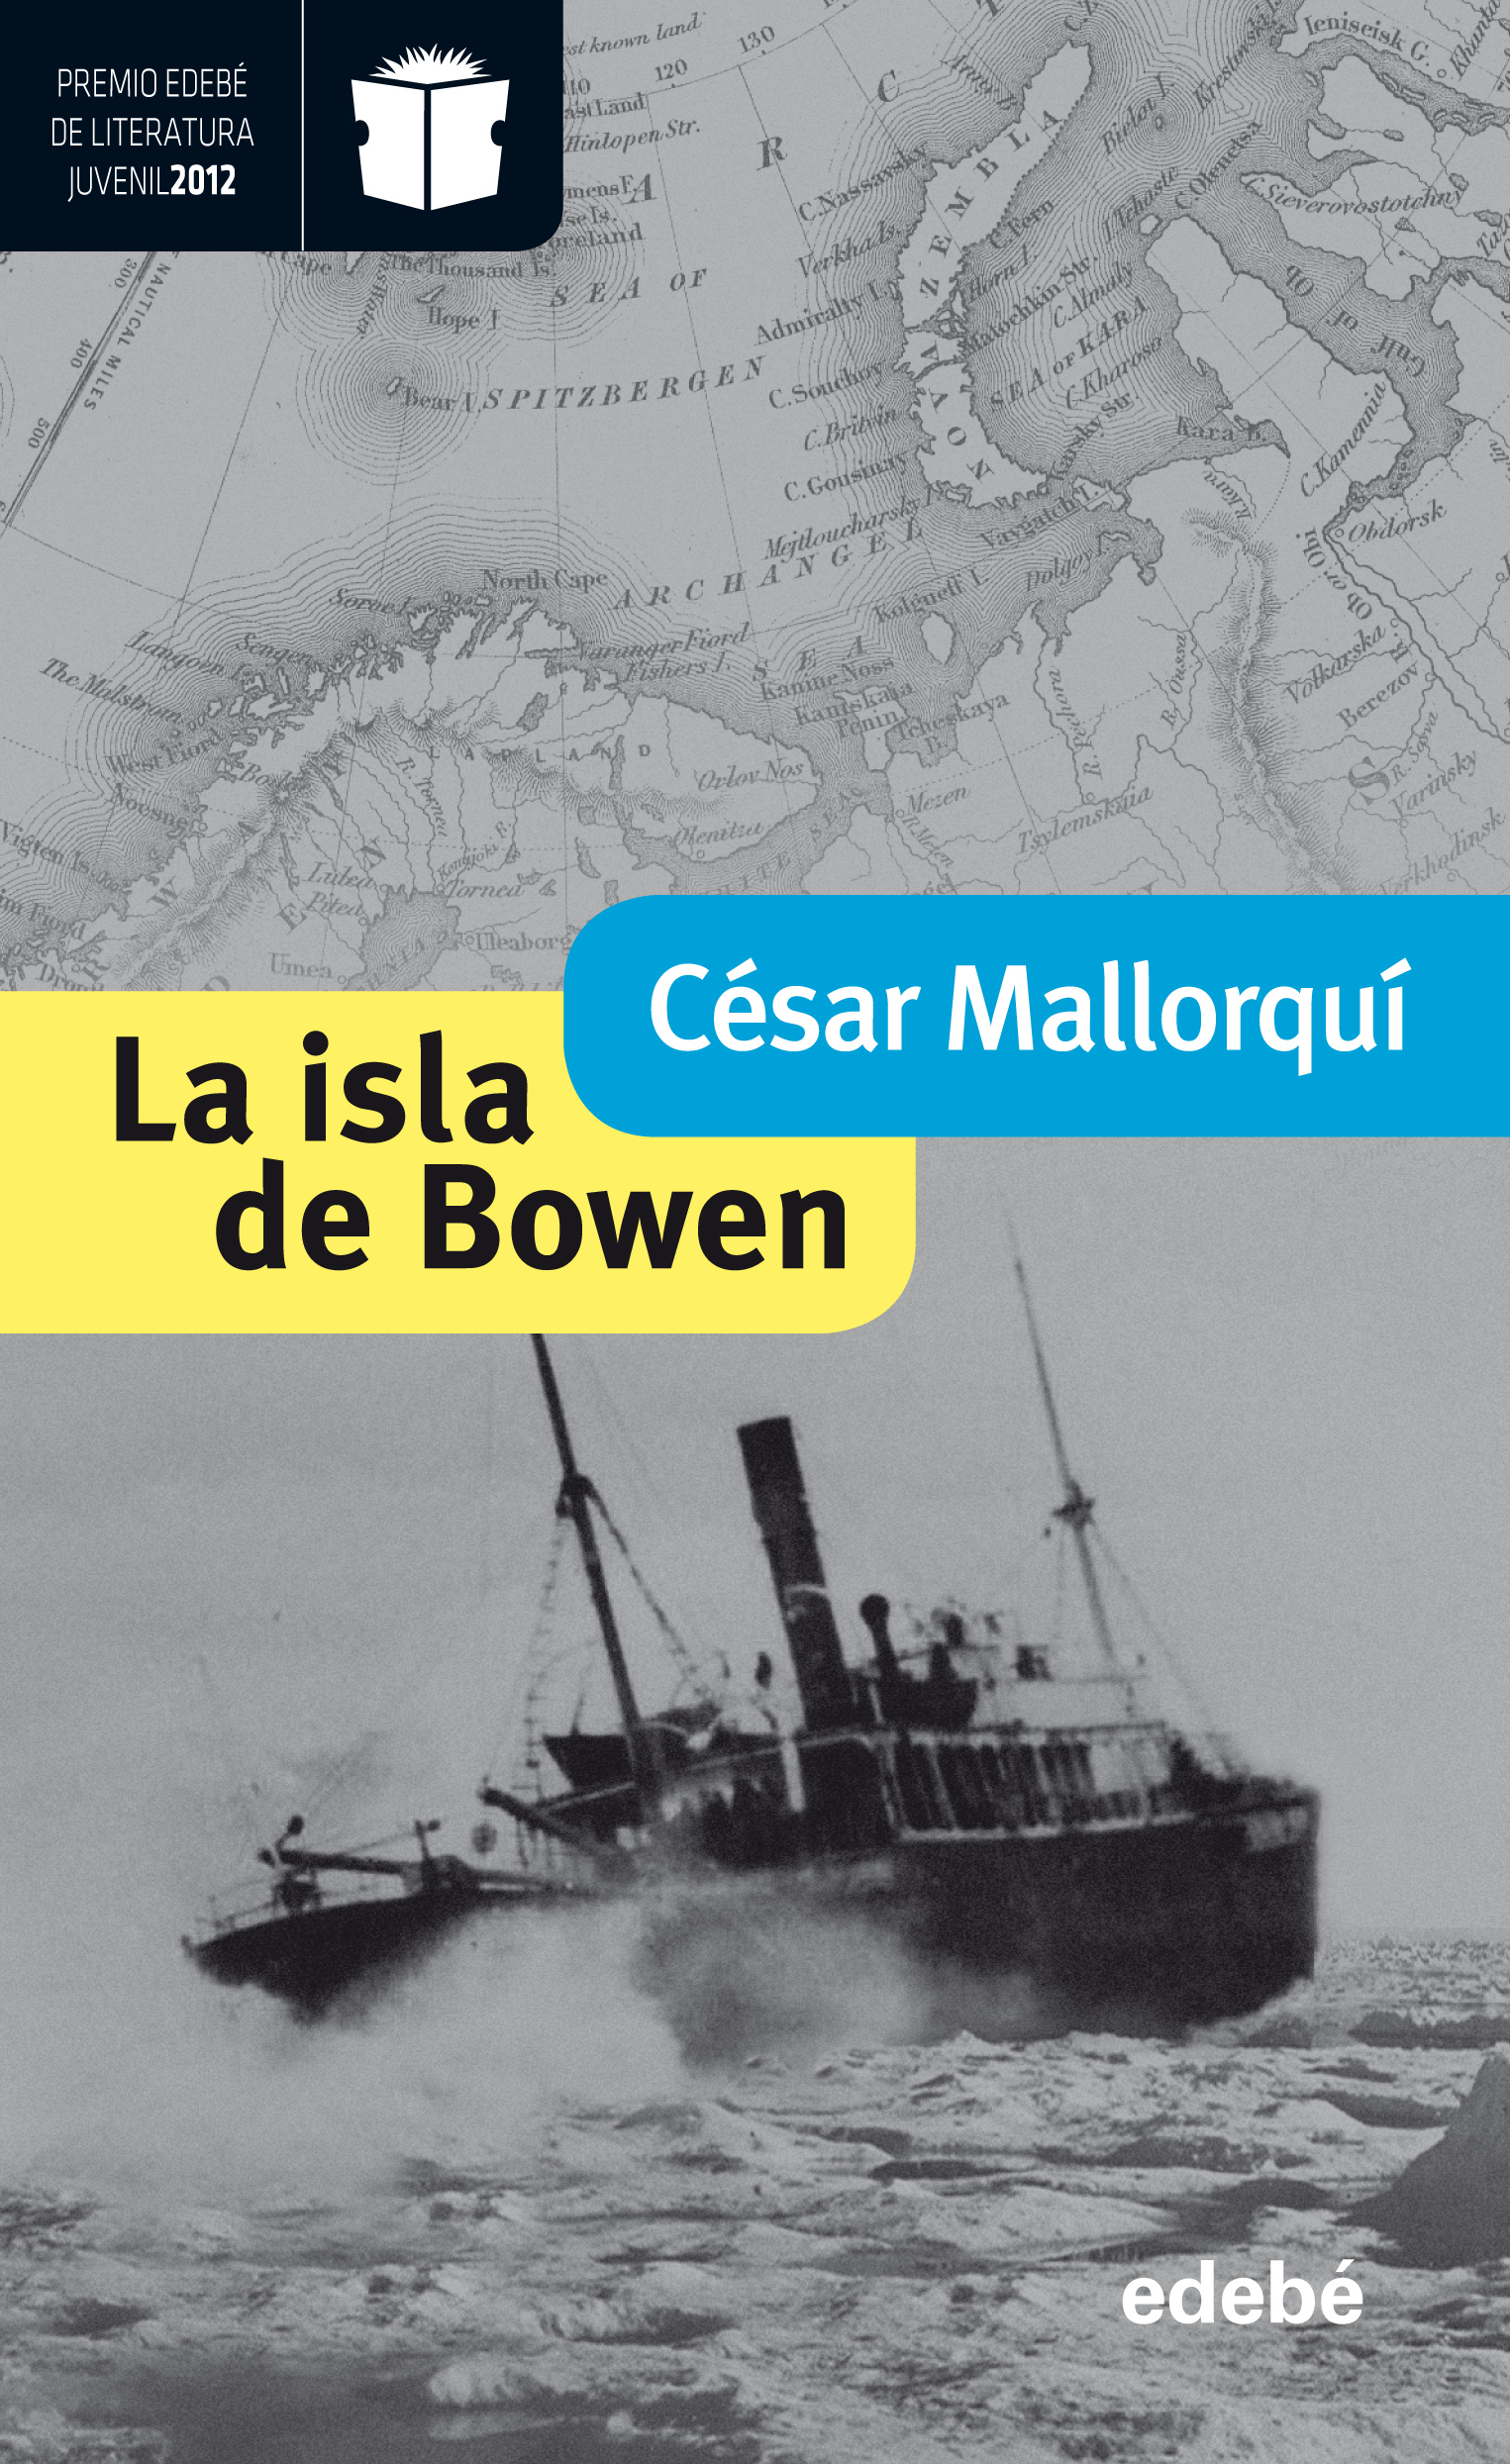 http://prensa.edebe.com/wp-content/uploads/2013/07/830427_La-isla-de-Bowen_PRMIO-2012_cast.jpg